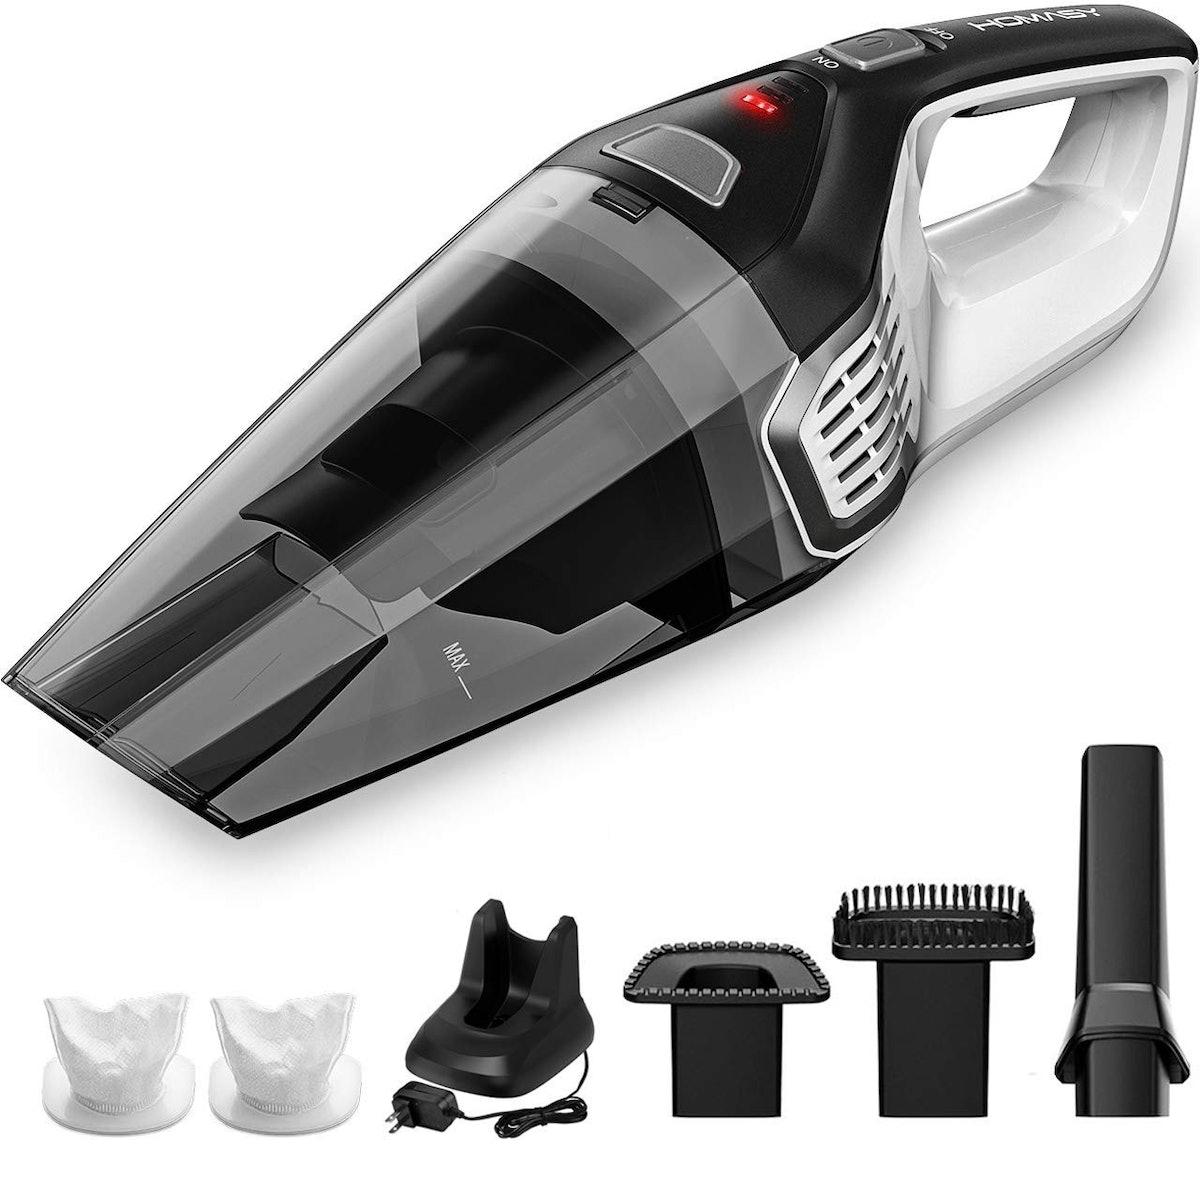 Homasy Handheld Vacuum Cleaner